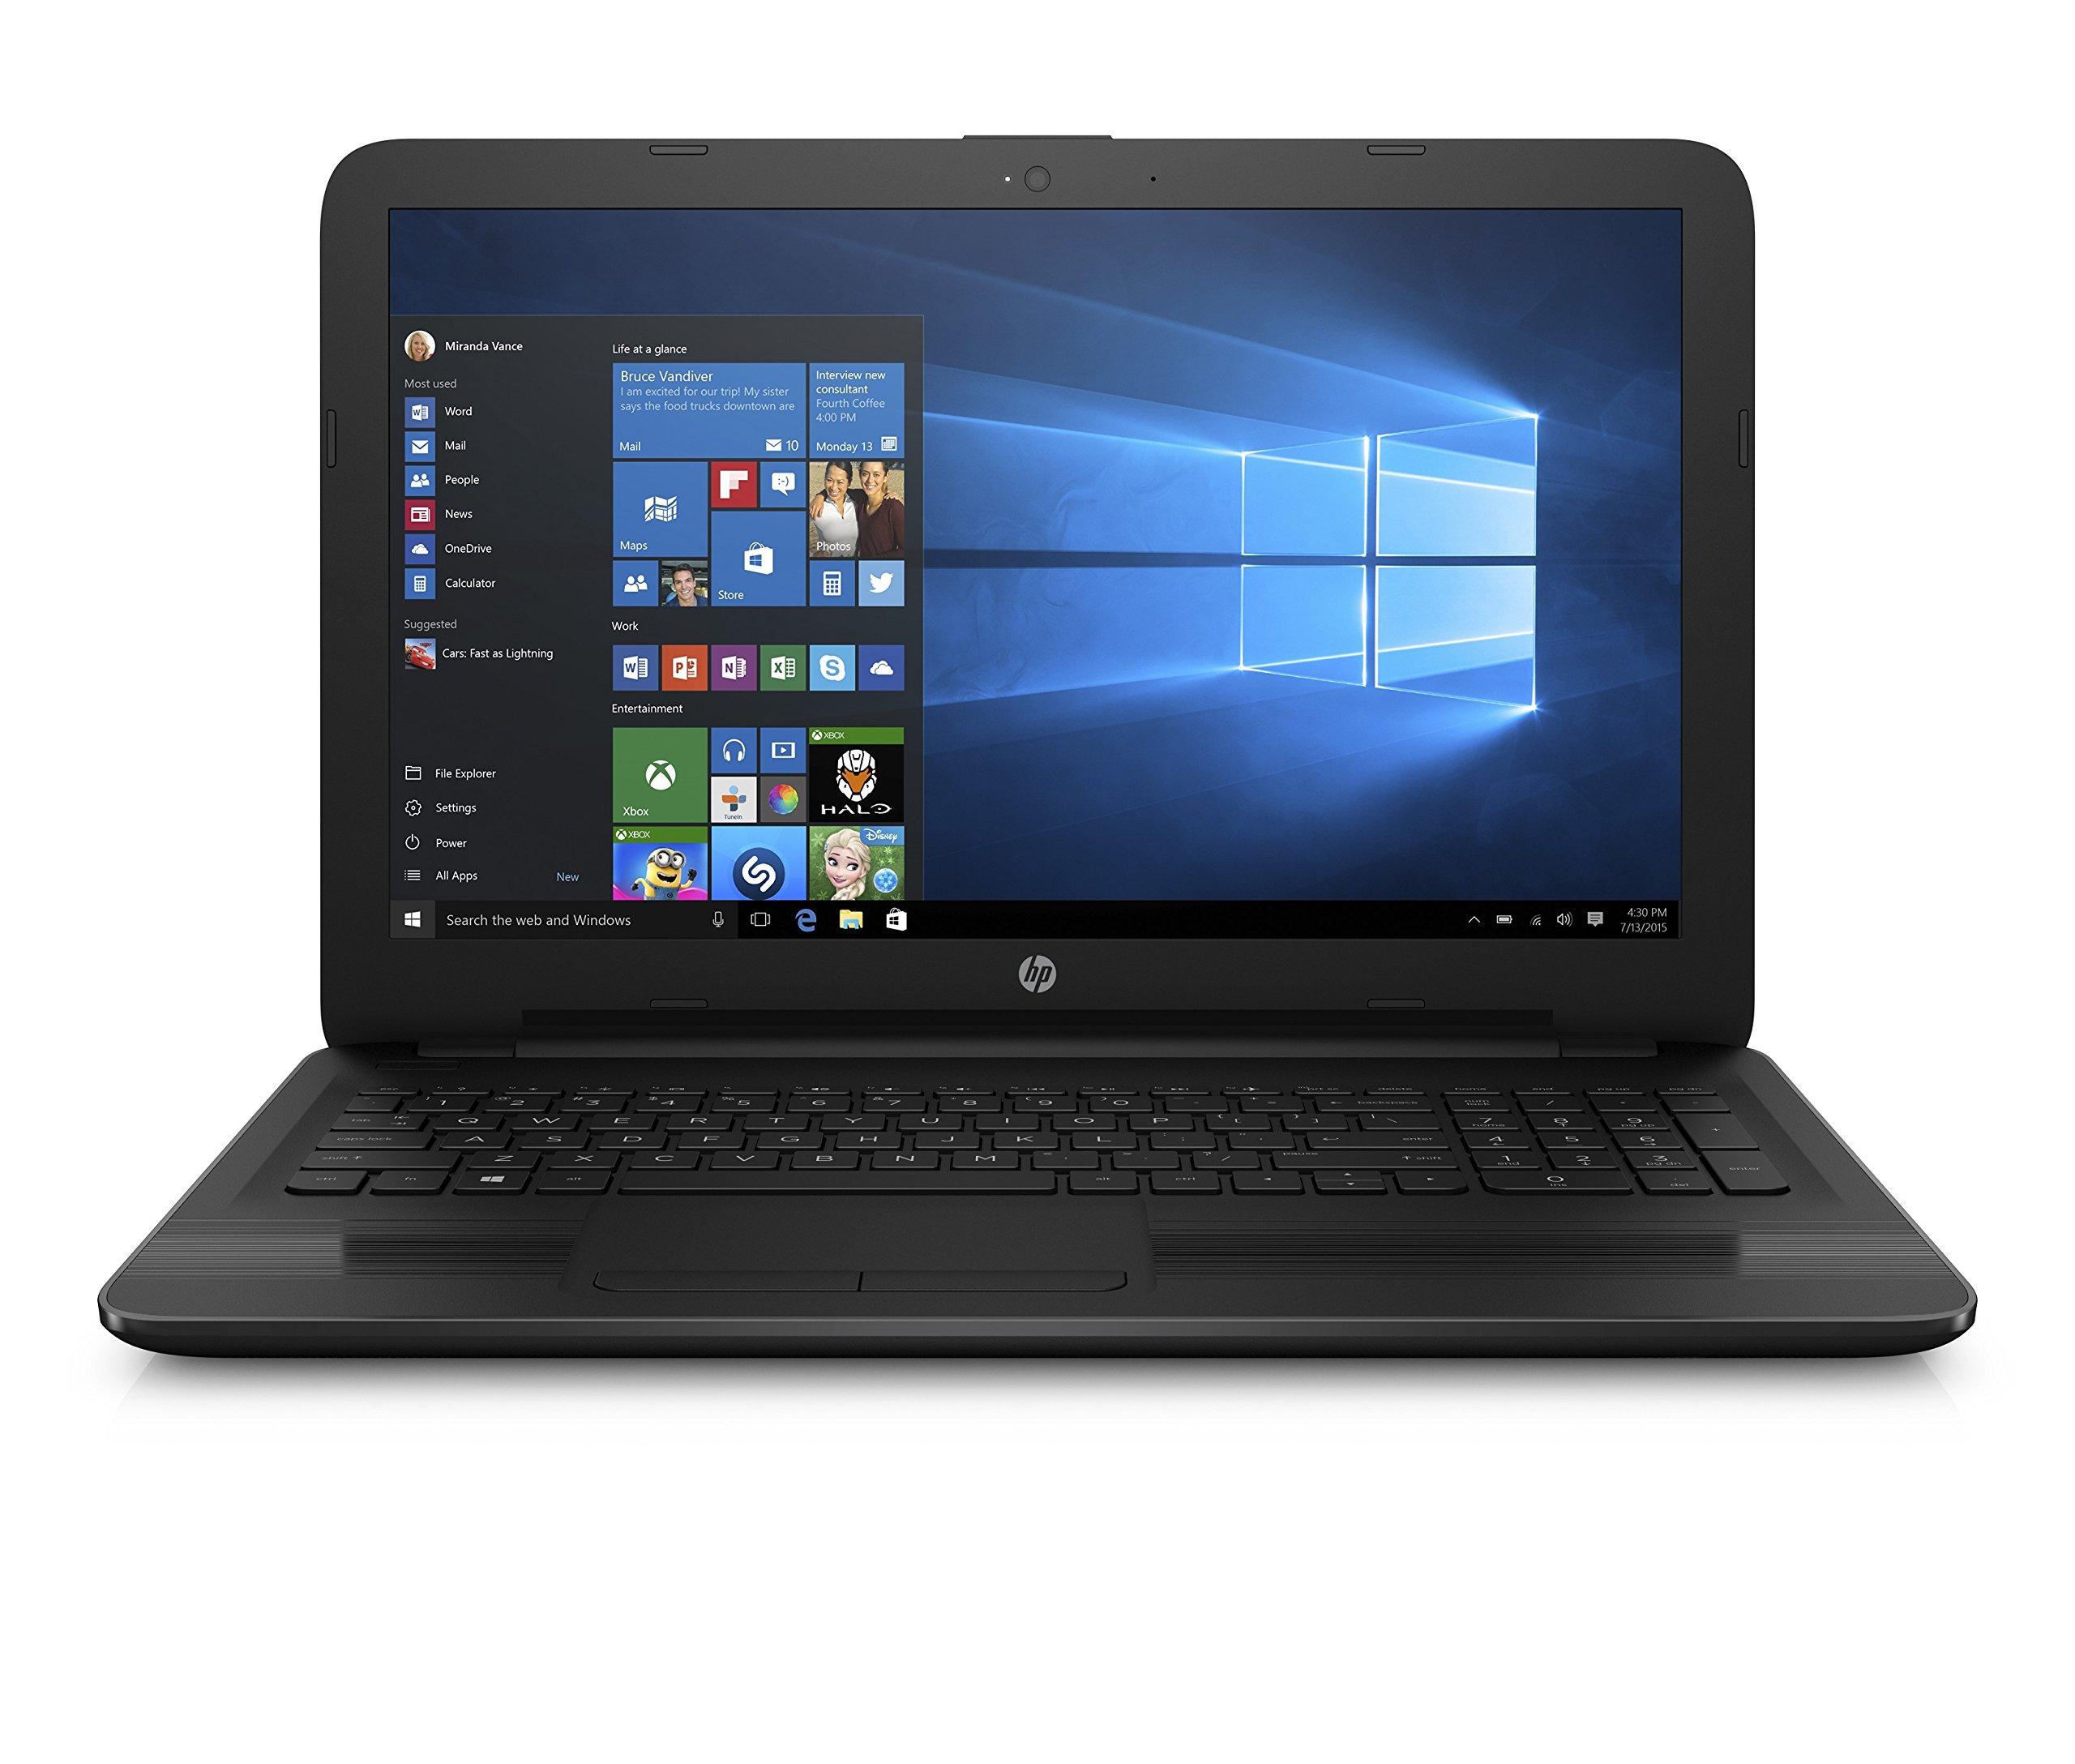 New HP Notebook Laptop 15.6 HD Vibrant Display Quad Core AMD E2-7110 APU 1.8GHz 4GB RAM 500GB HDD DVD Windows 10